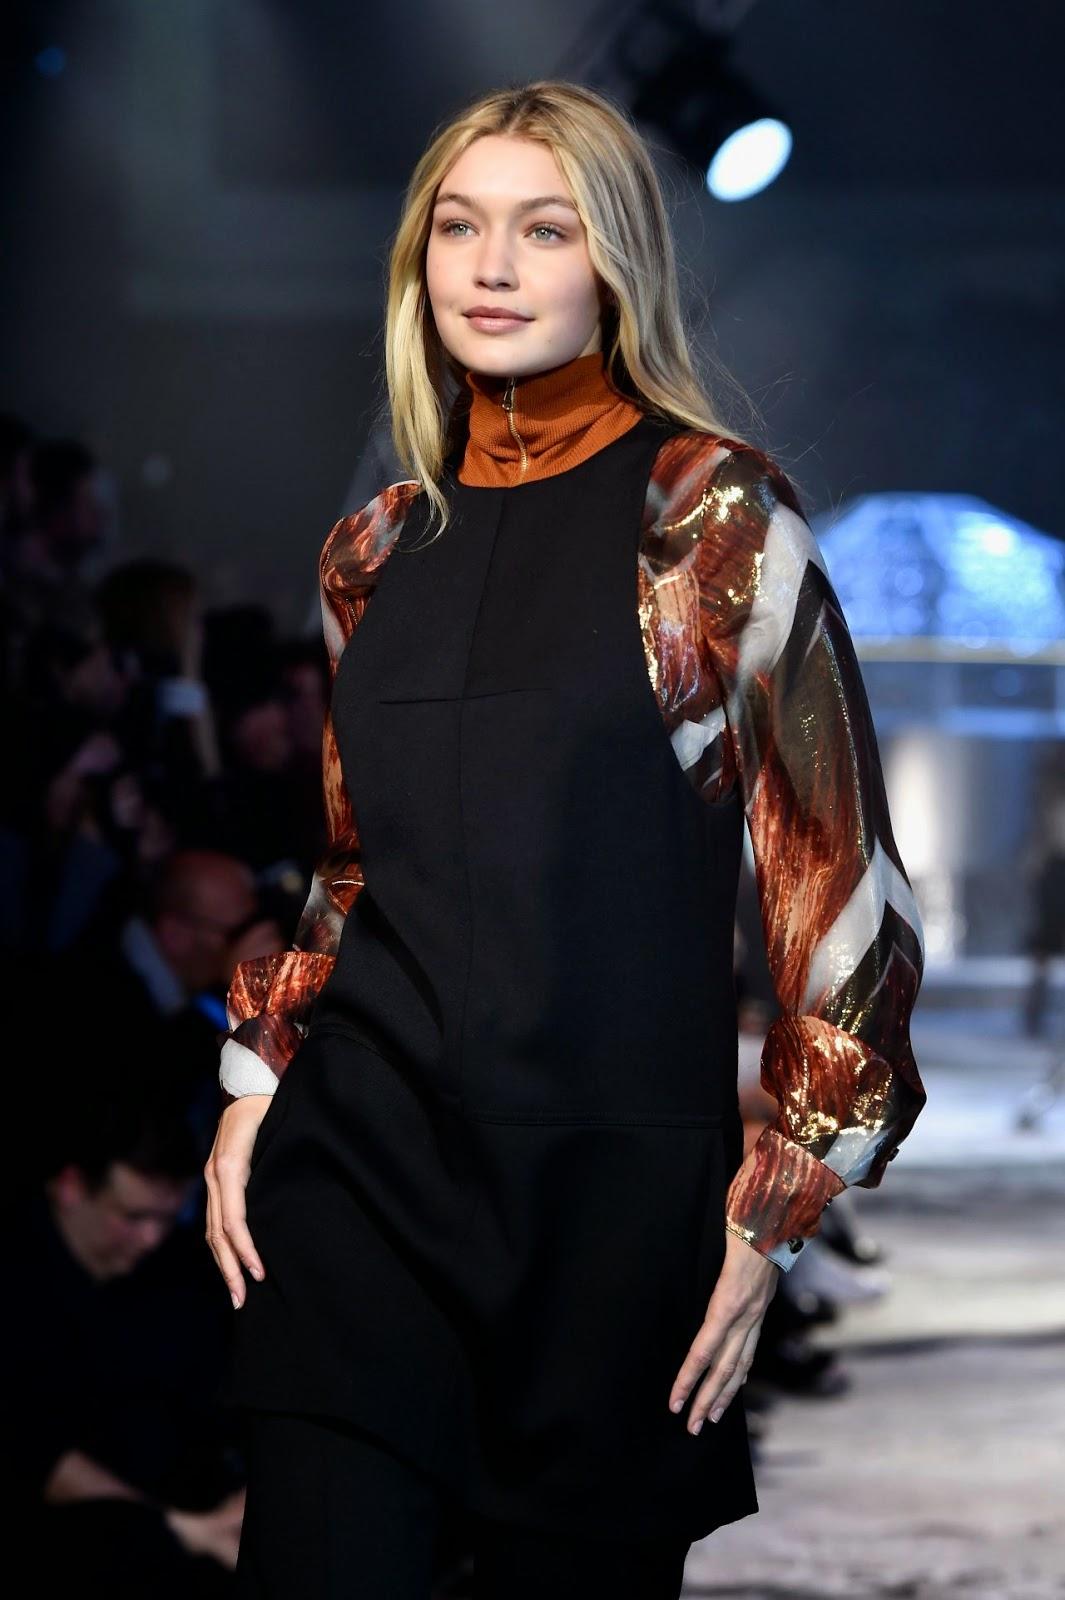 Gigi Hadid flaunts demure styles at the H&M Paris Fashion Week Show